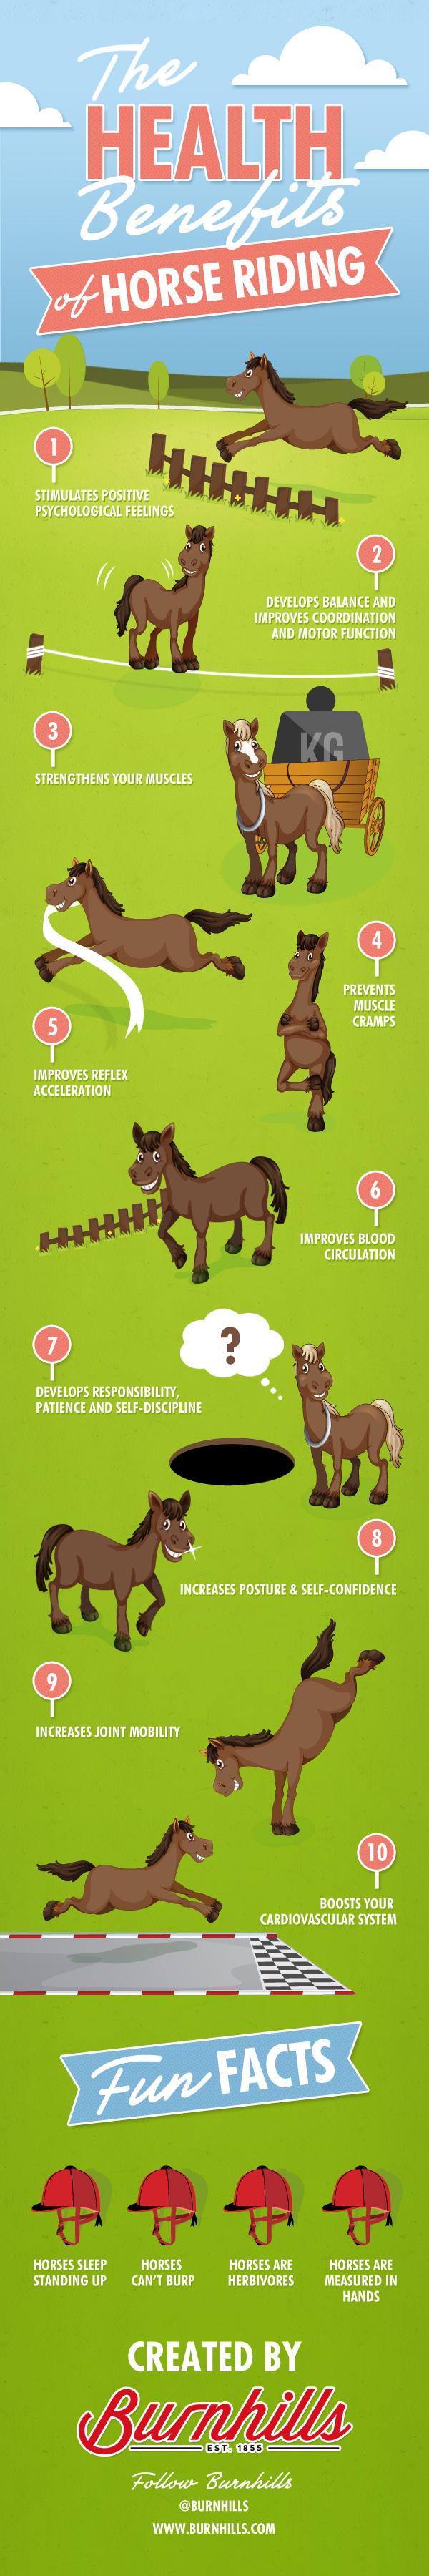 Burnhills-infographic